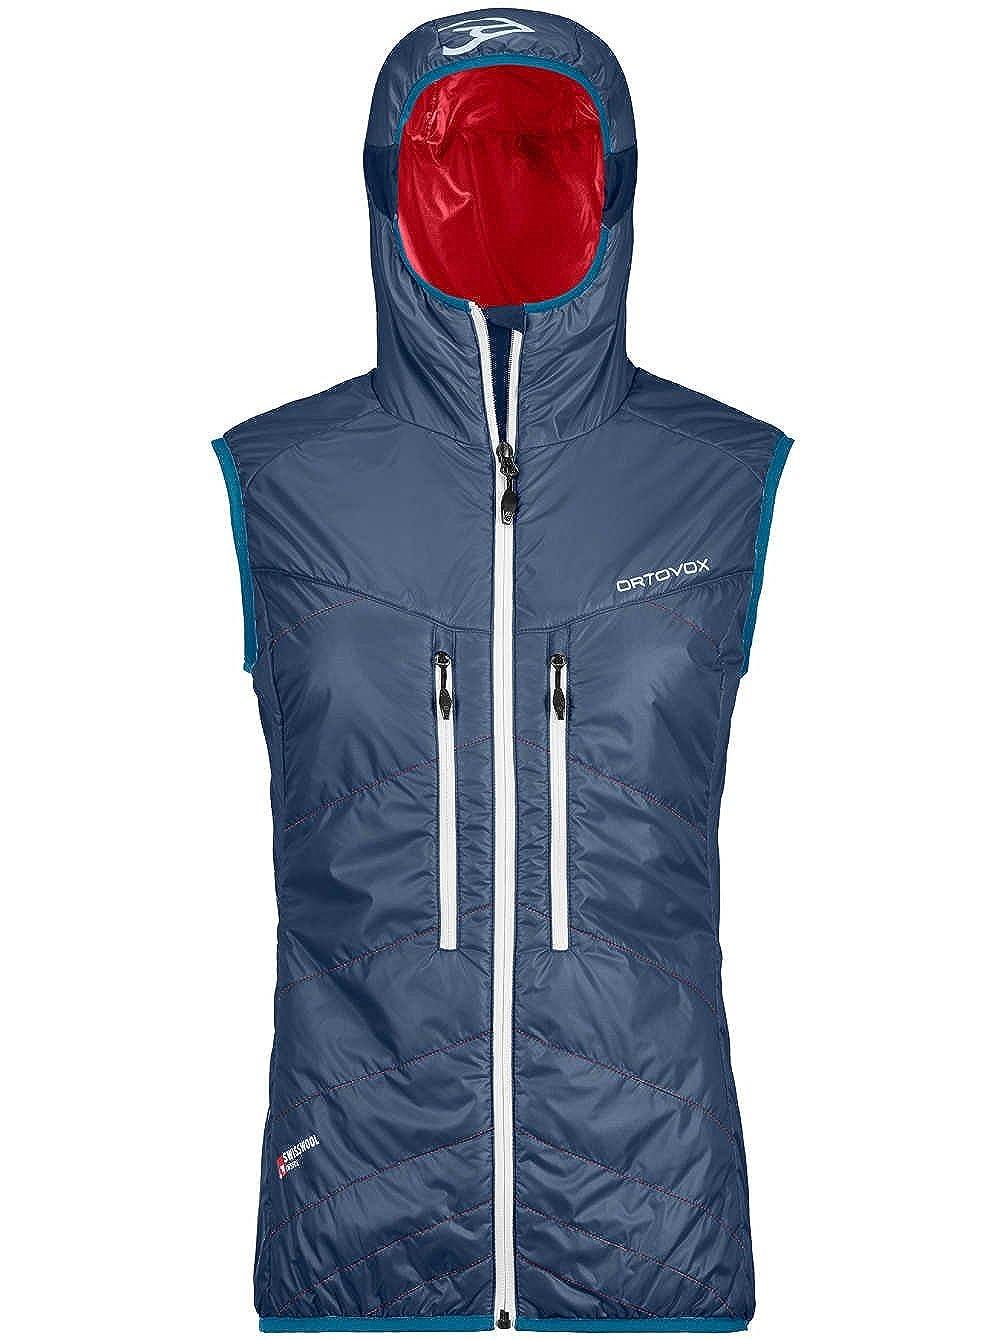 Womens 6105300010 Ortovox Lavarella Vest